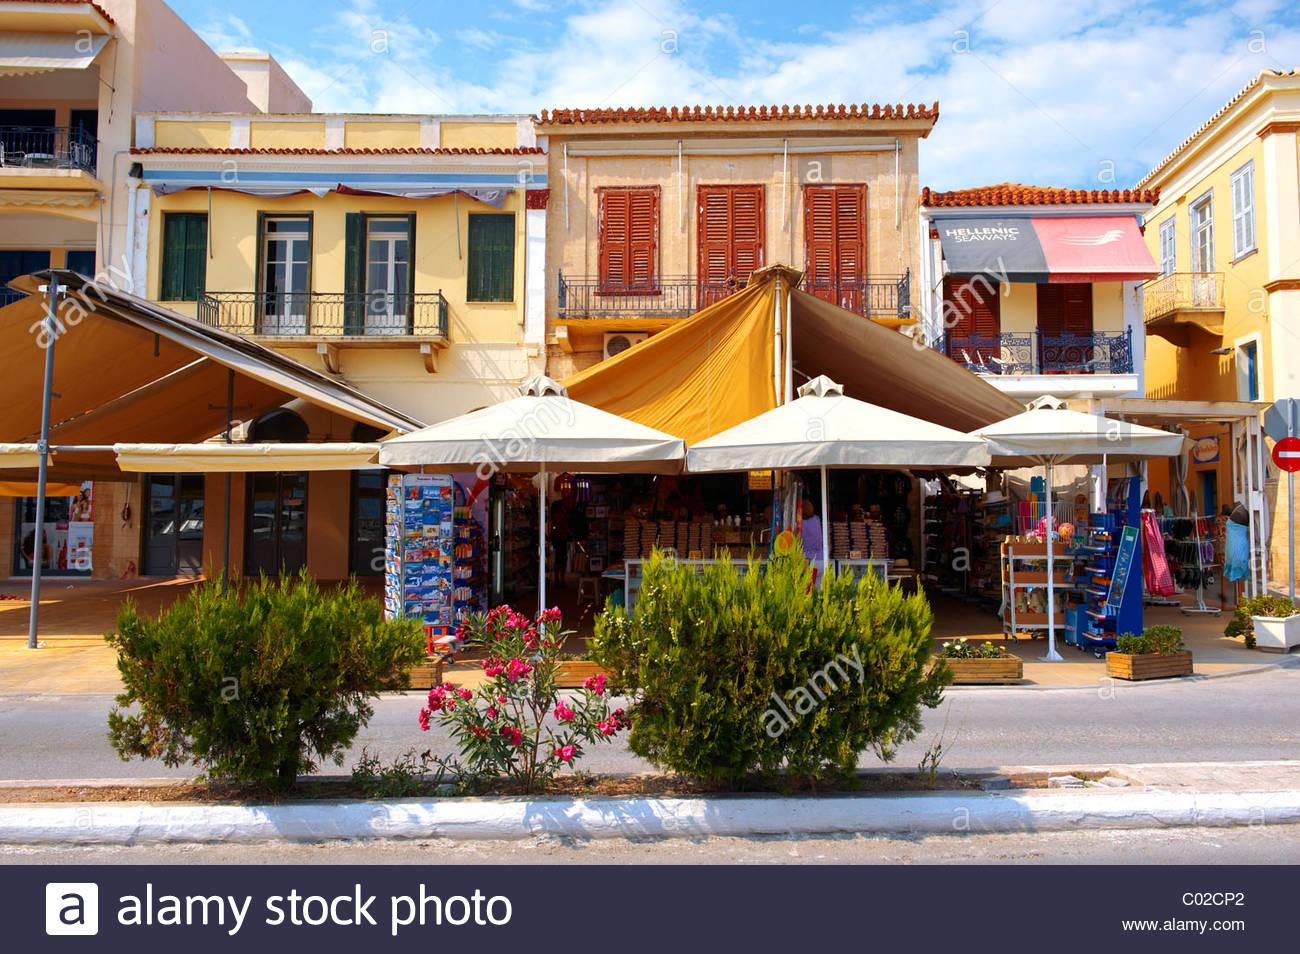 Typical port buildings of Aegins, Greek Saronic Islands - Stock Image